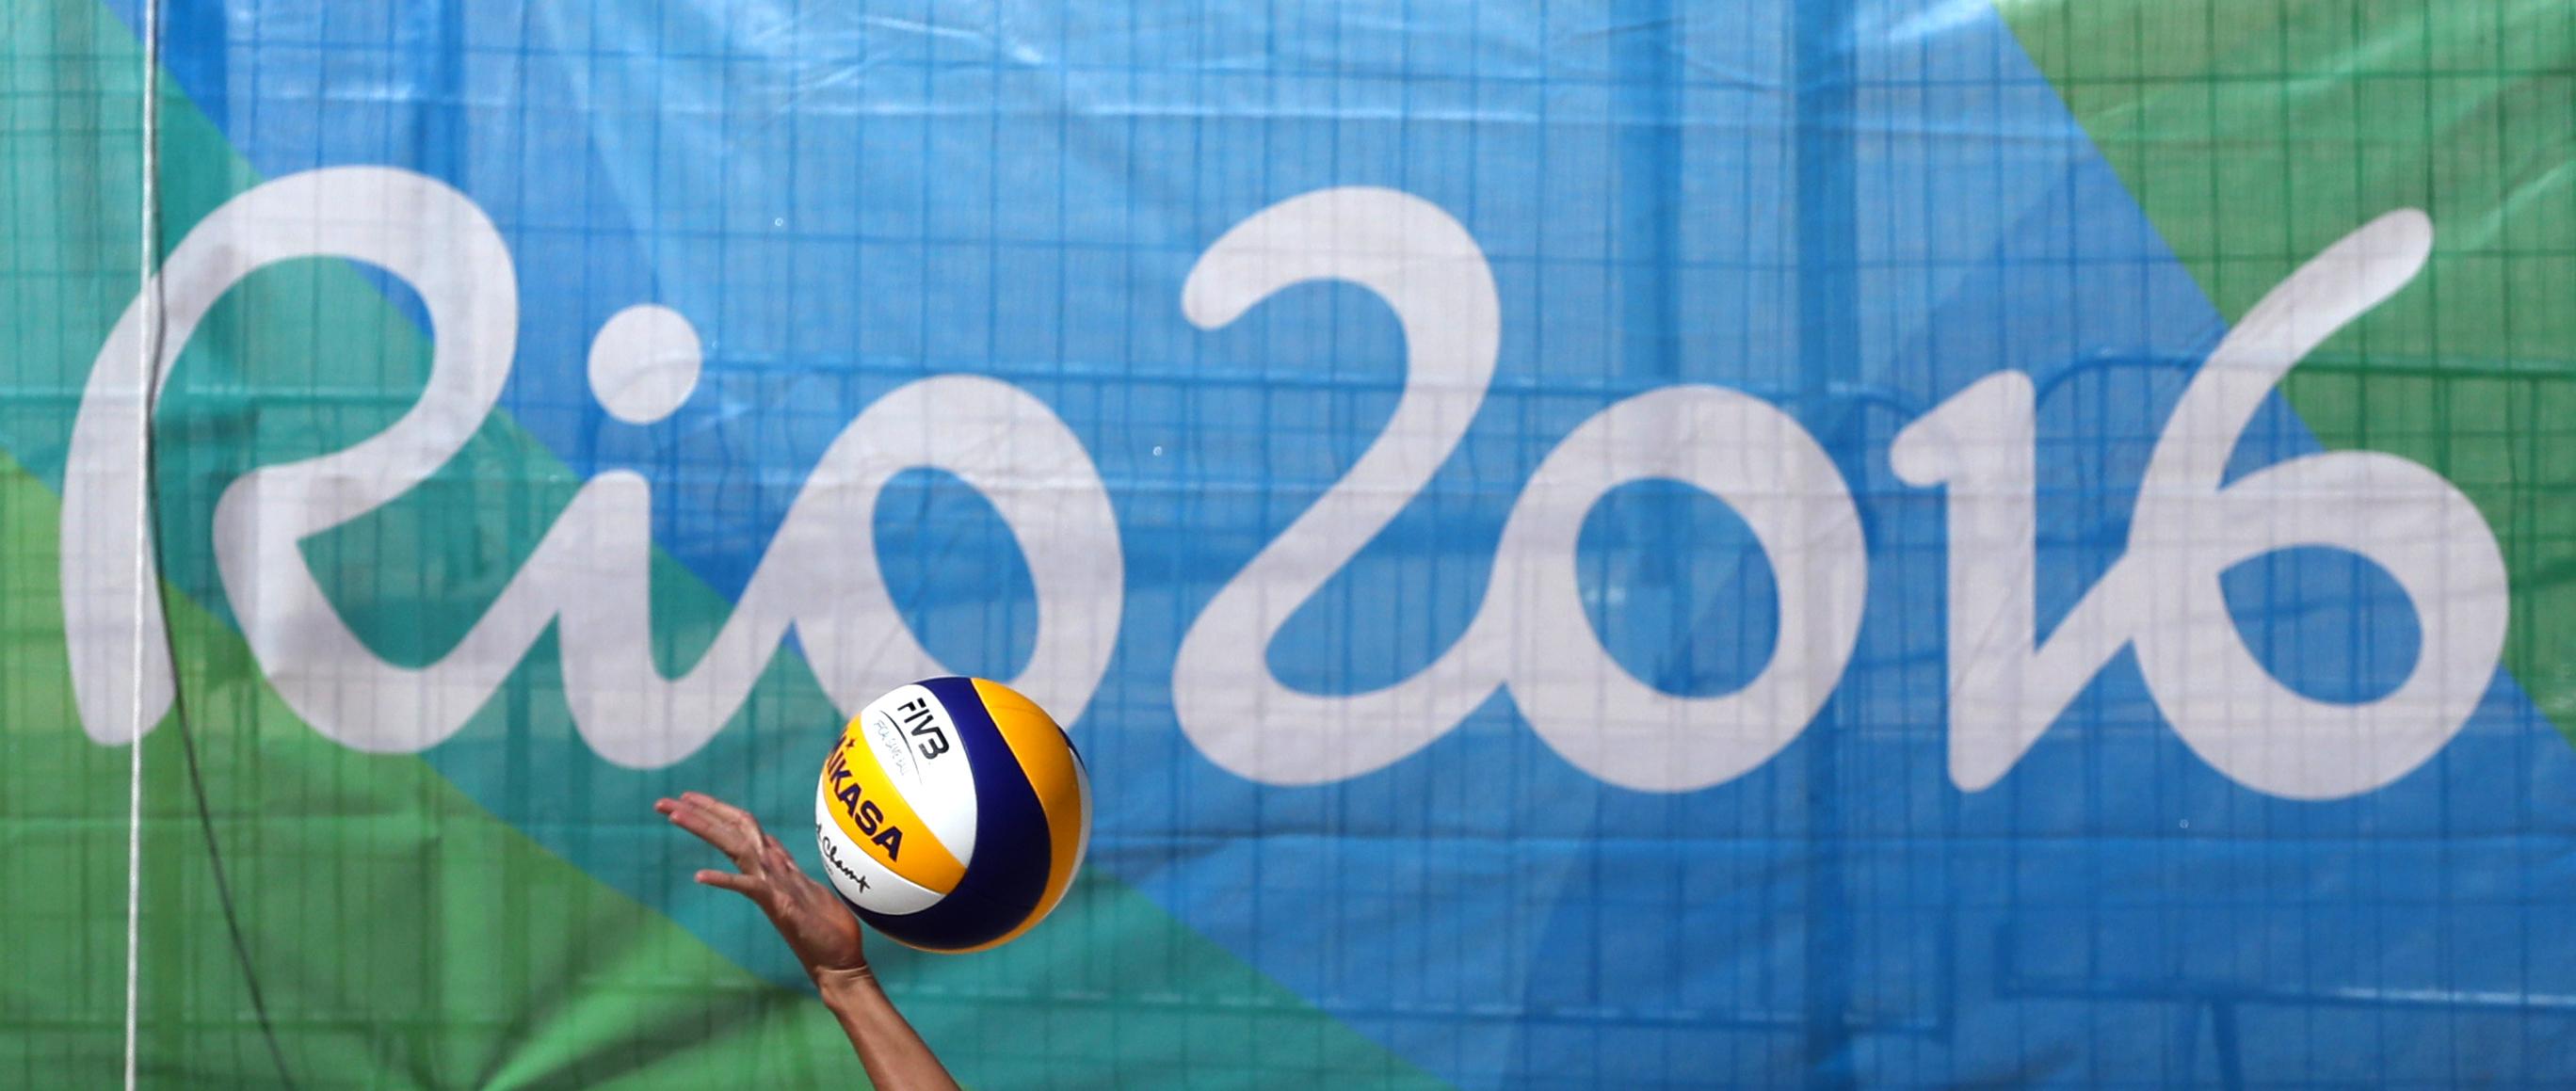 An athlete serves a ball during her training at the Copacabana beach volleyball arena prior the 2016 Summer Olympics in Rio de Janeiro, Brazil, Thursday, Aug. 4, 2016. (AP Photo/Petr David Josek)